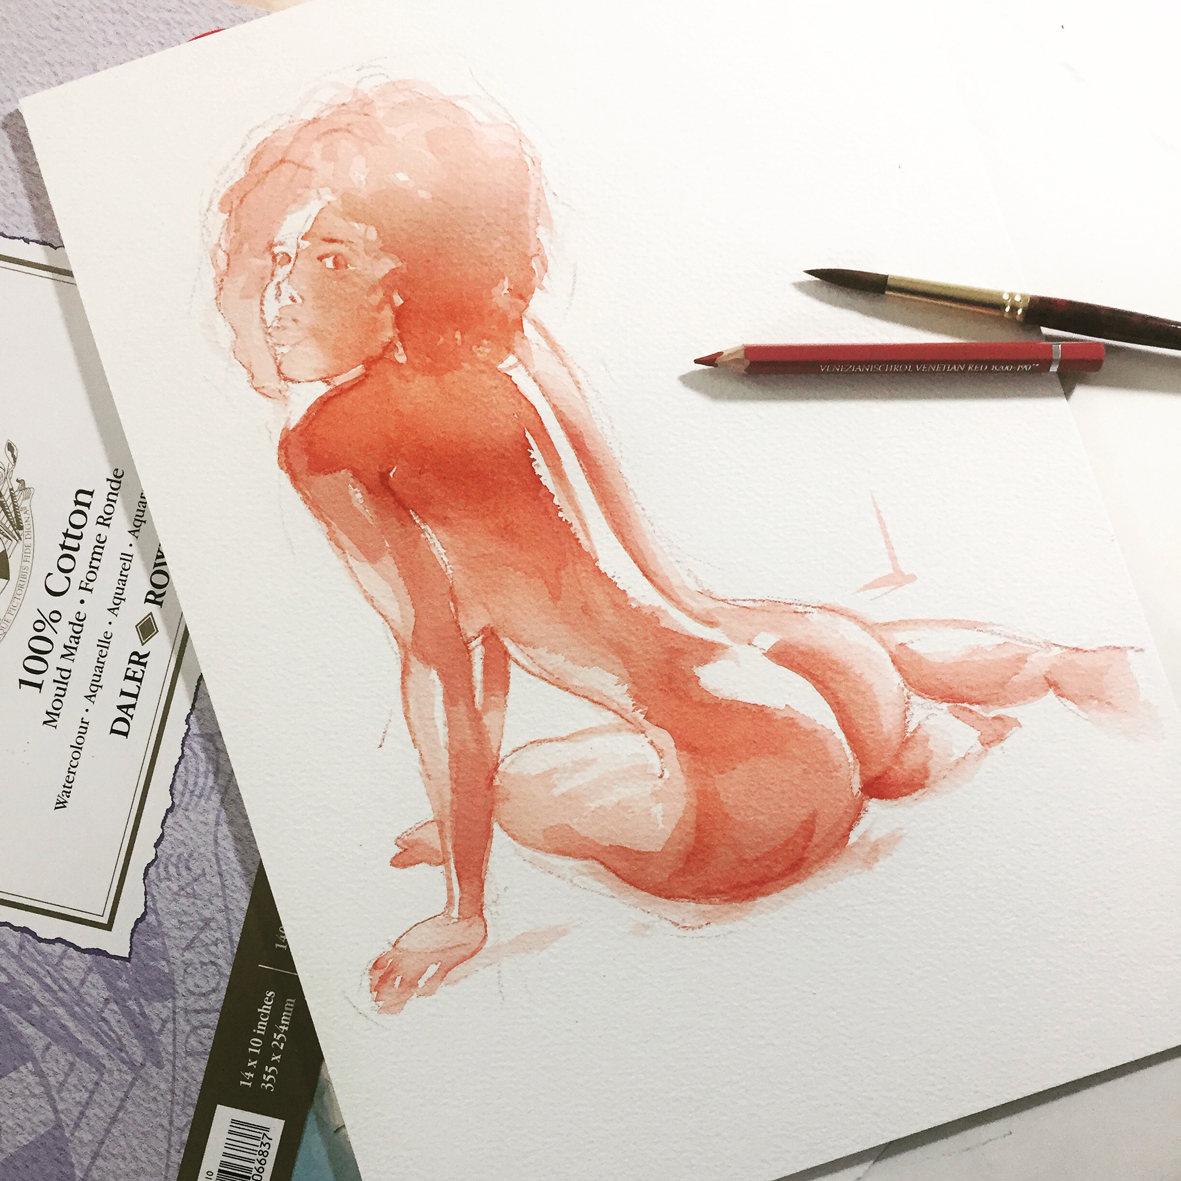 007 Nereida Vito Lentini Designer Acquarelli Sketches